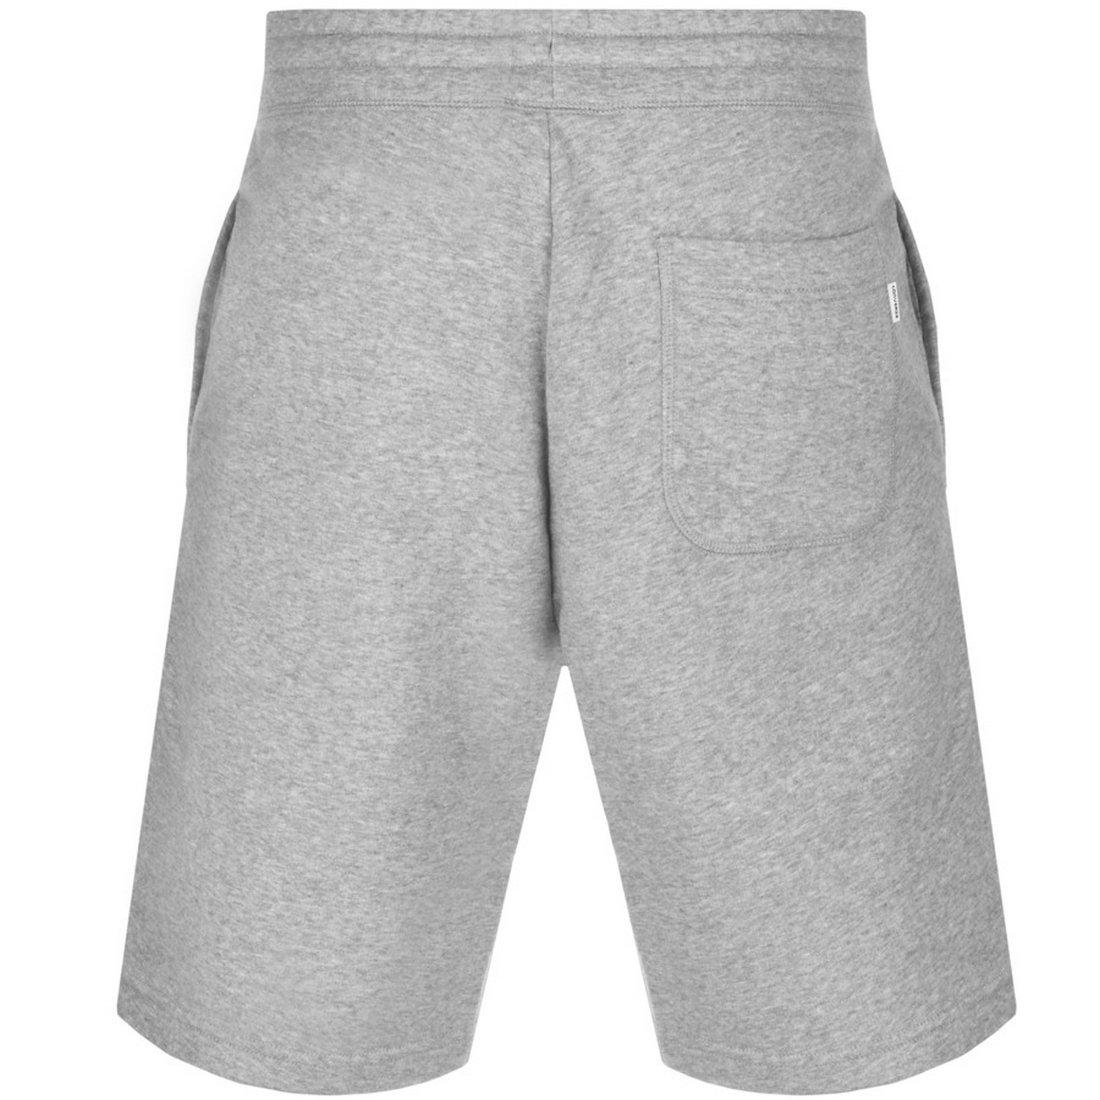 a539e2cc2519 Midland Bargains Grey Mens Converse All Star Core Jersey Shorts Grey -  Large  Amazon.co.uk  Clothing